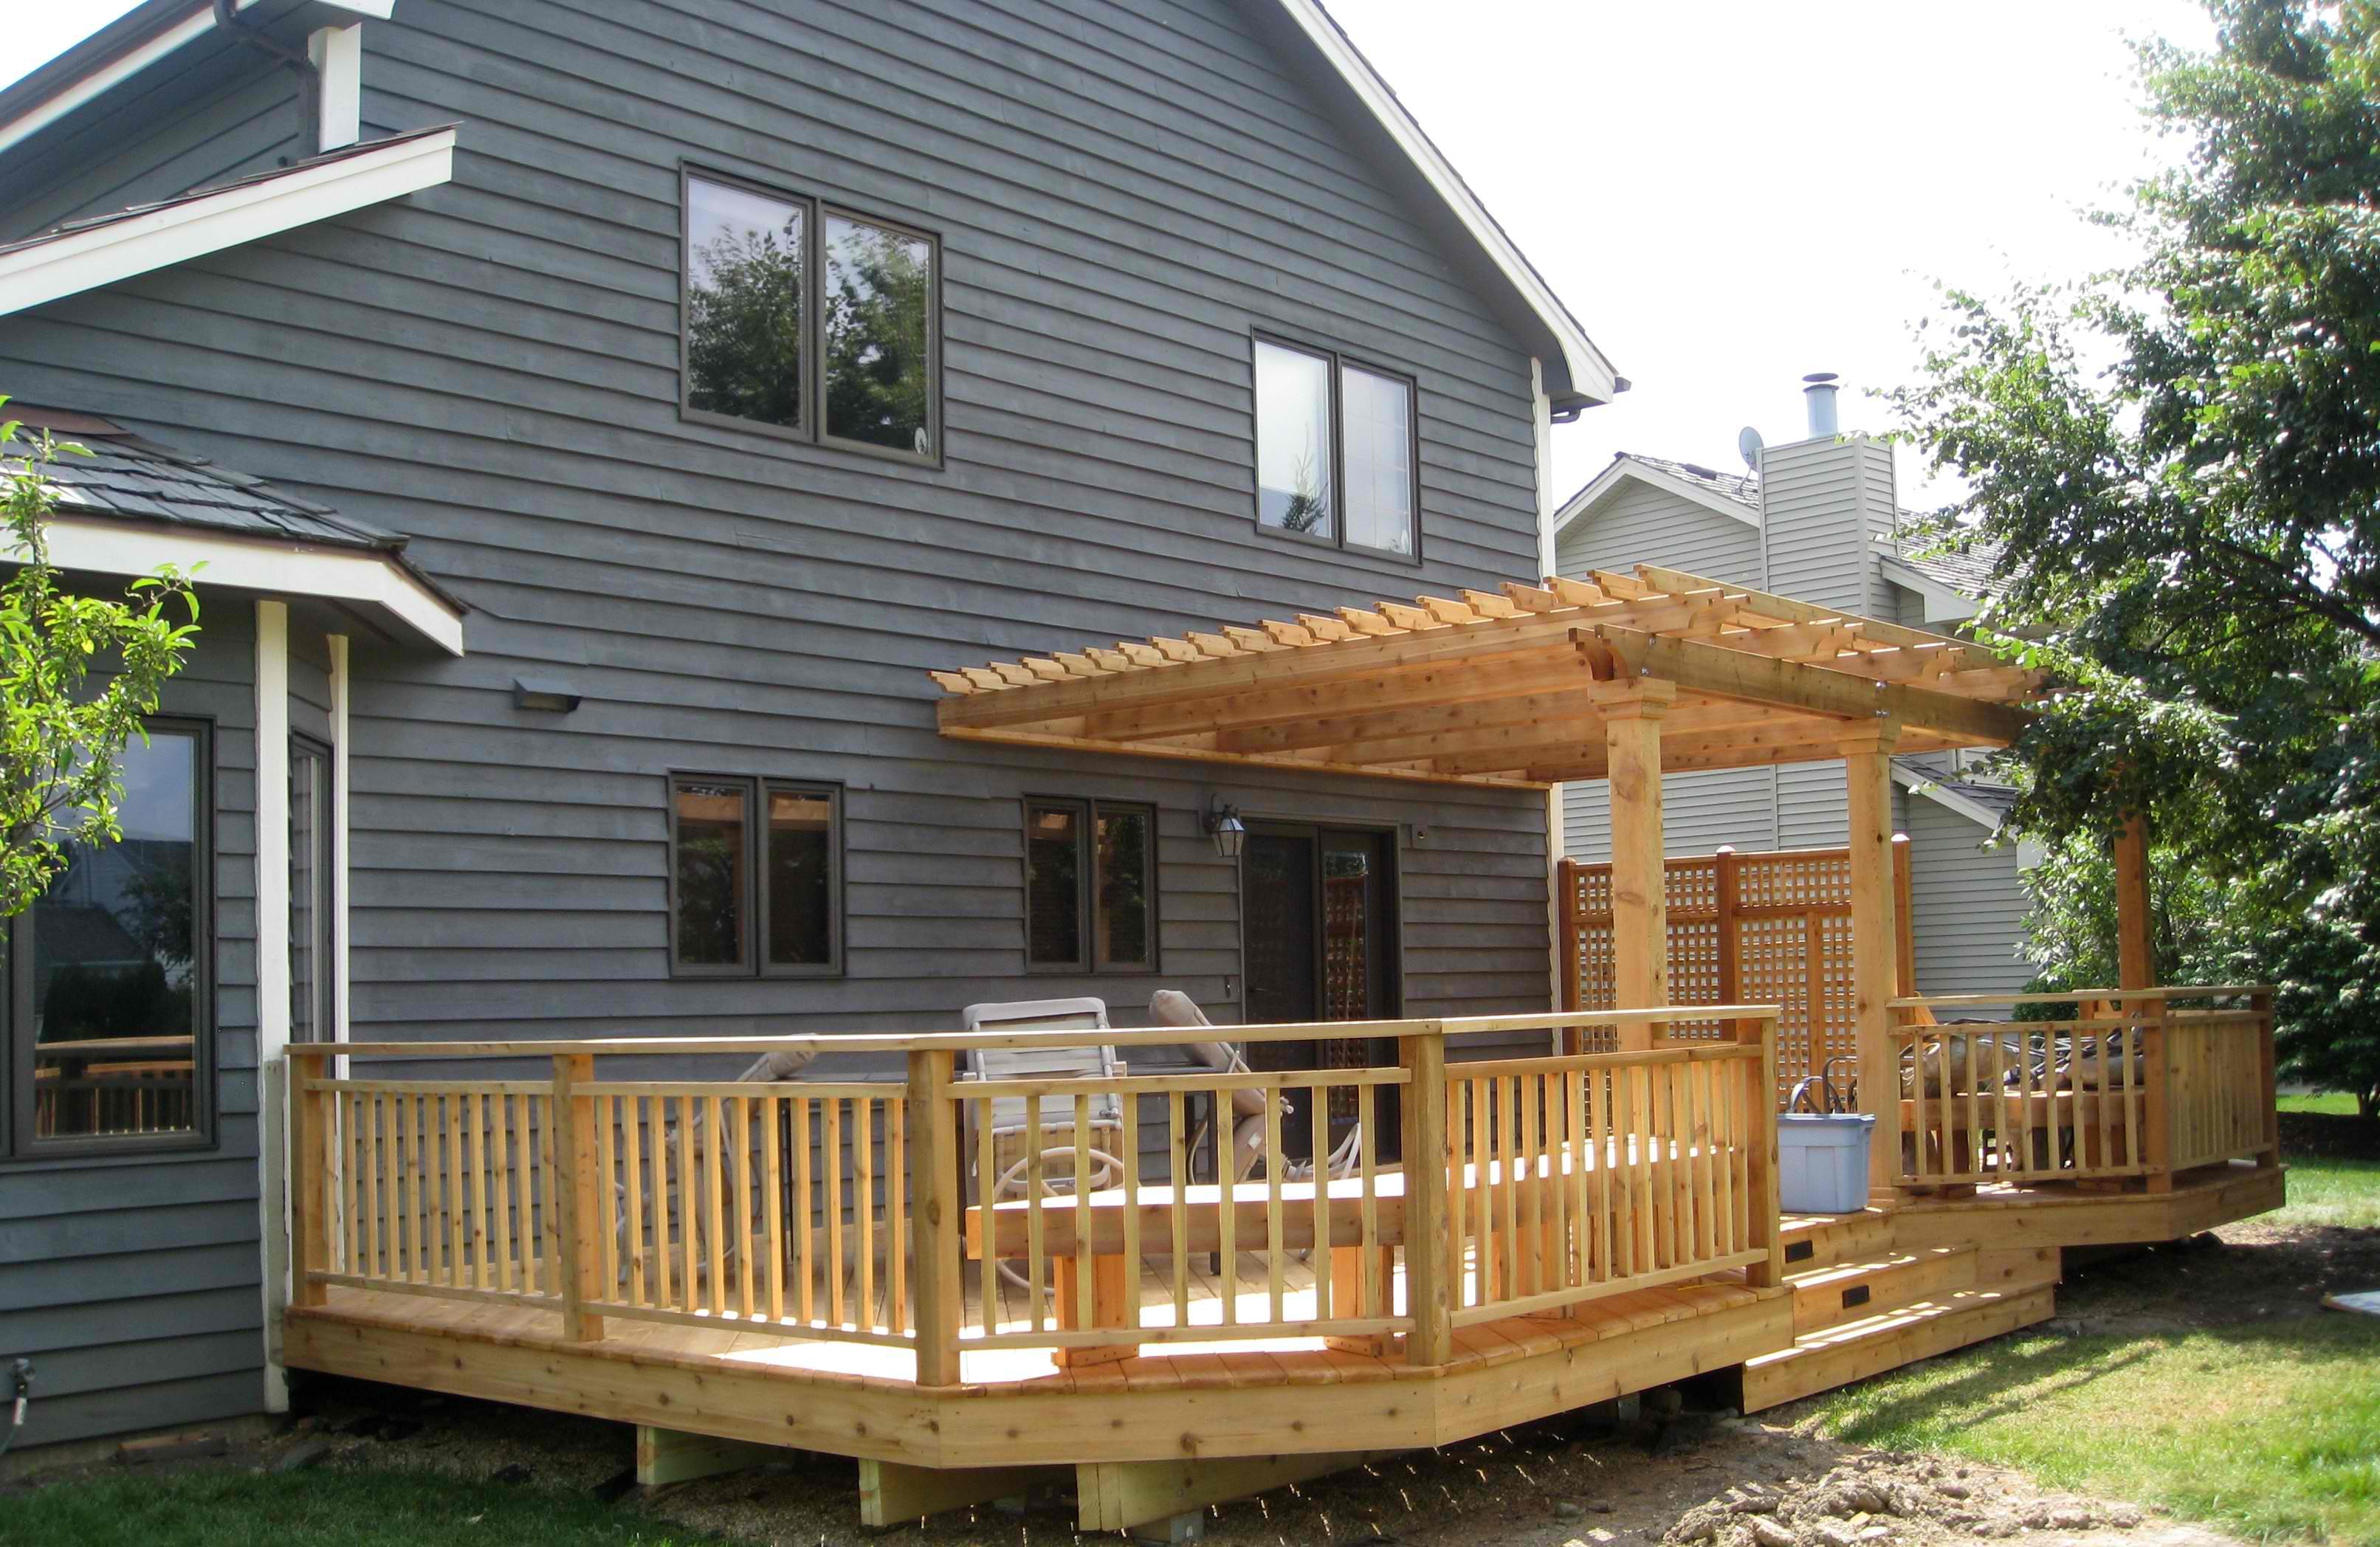 Decks & Light Construction Projects | Winston Salem ... on Patio With Deck Ideas id=52768